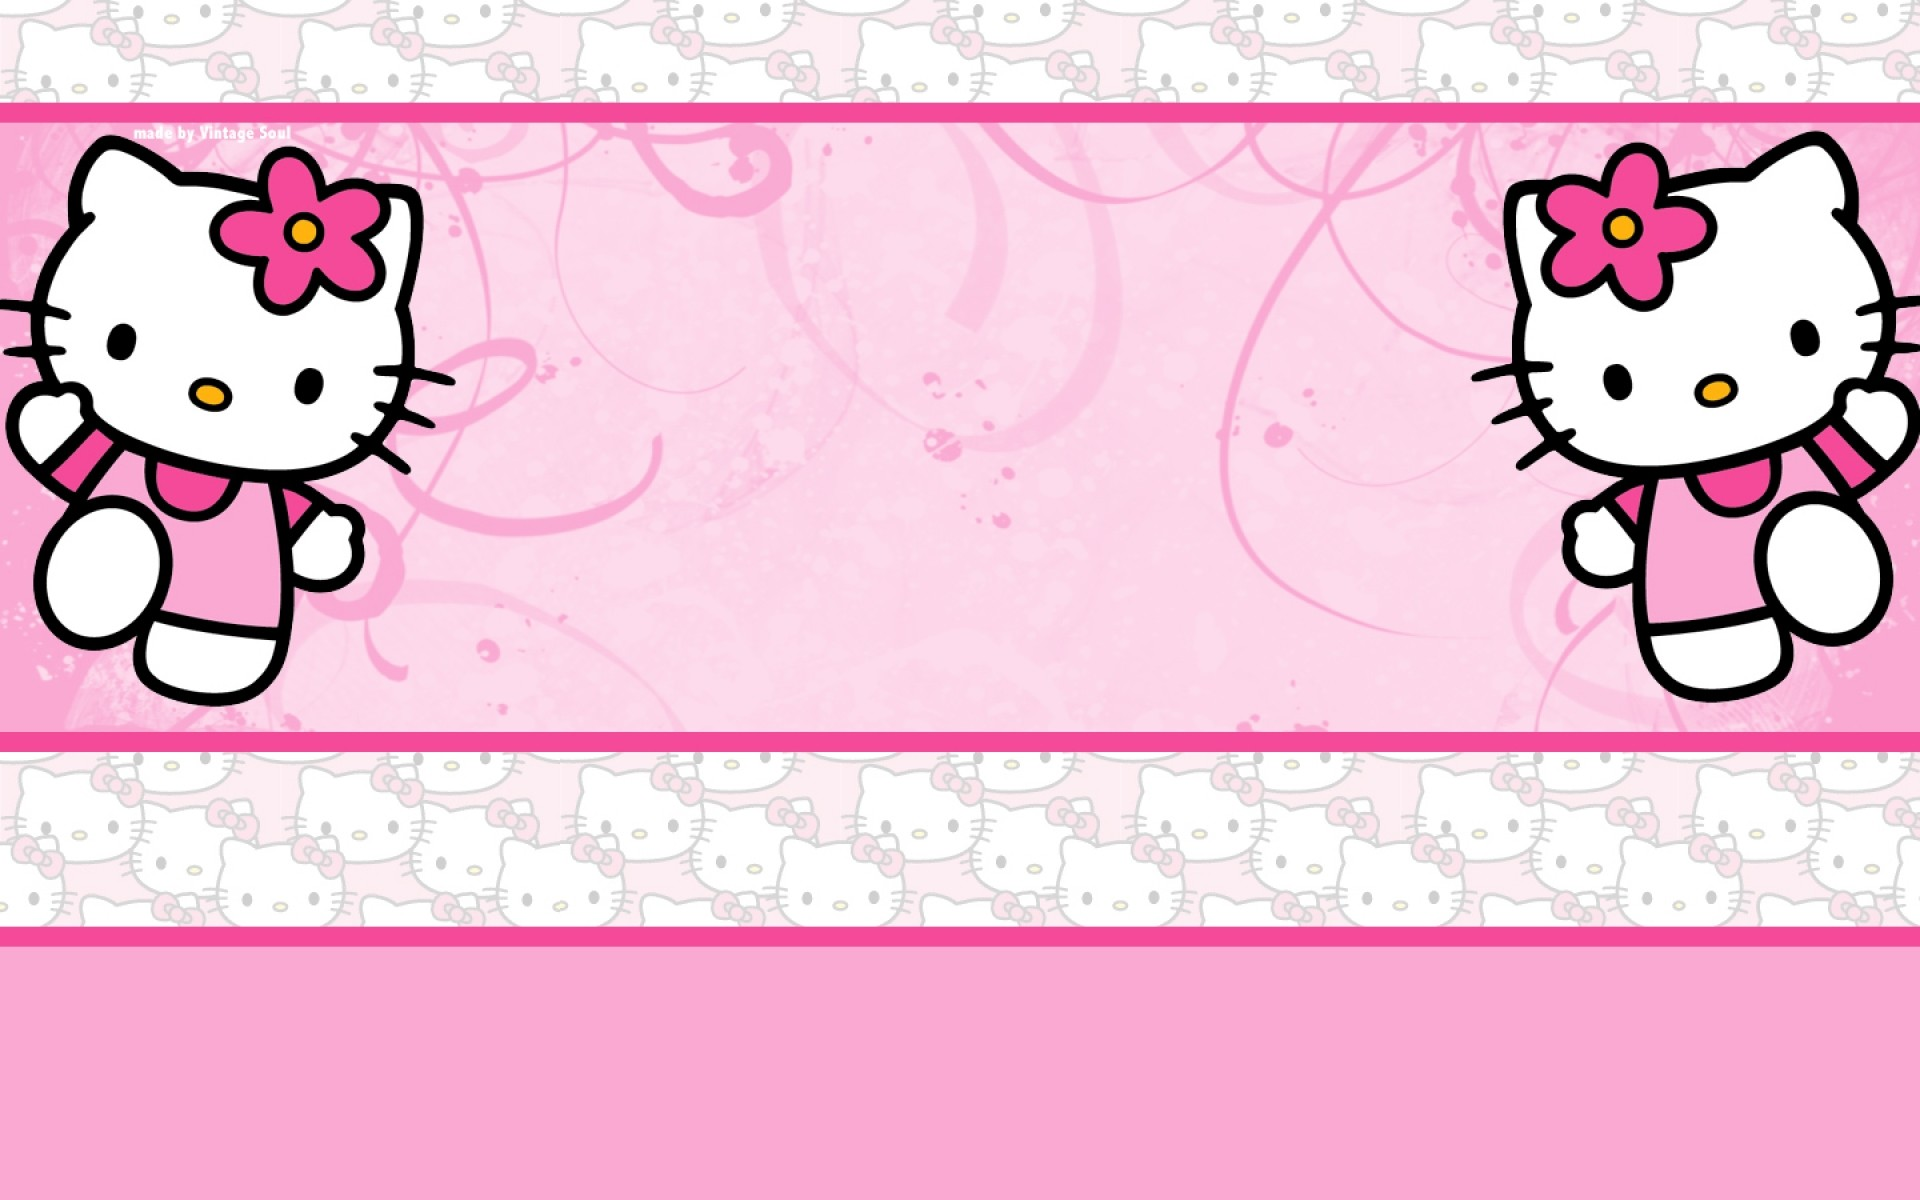 Simple Wallpaper Hello Kitty Desktop Background - 963835-hello-kitty-valentines-wallpaper-1920x1200-ipad  Collection_292718.jpg